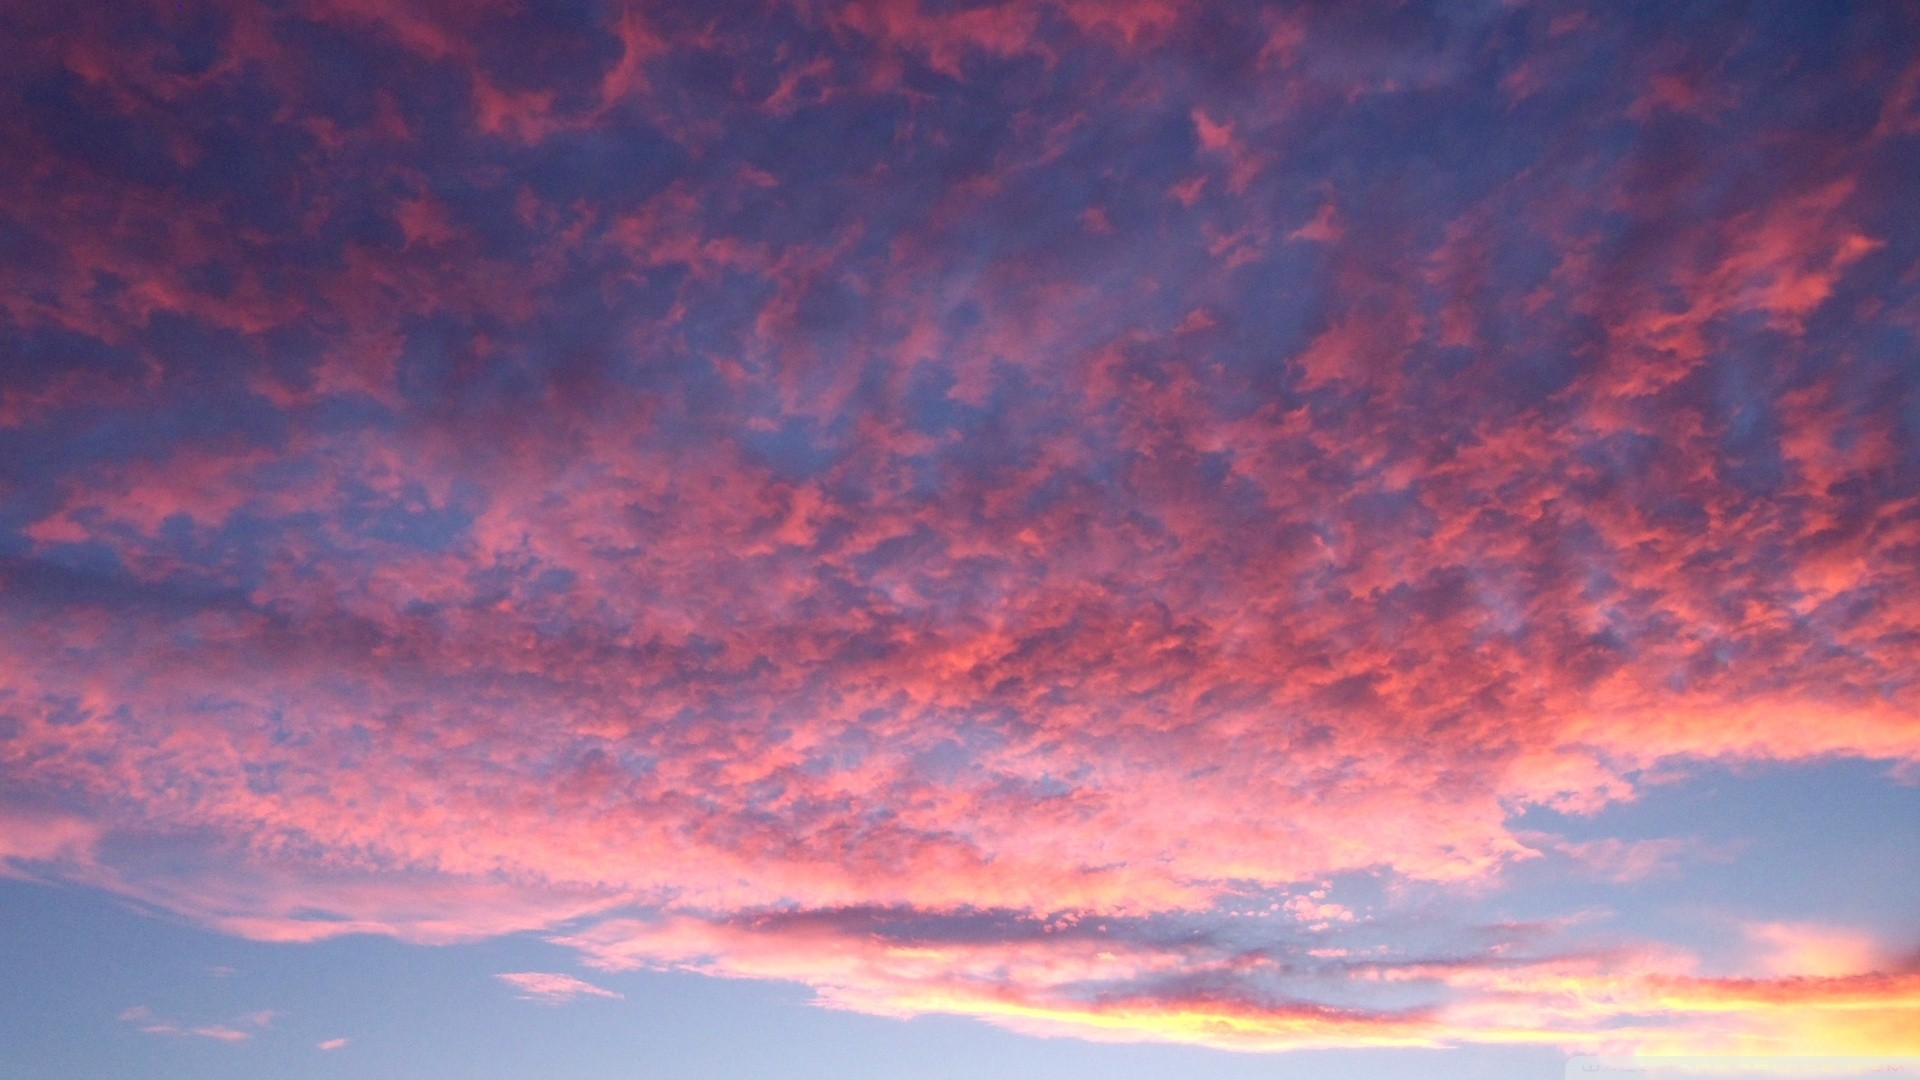 Pink Cloud wallpaper